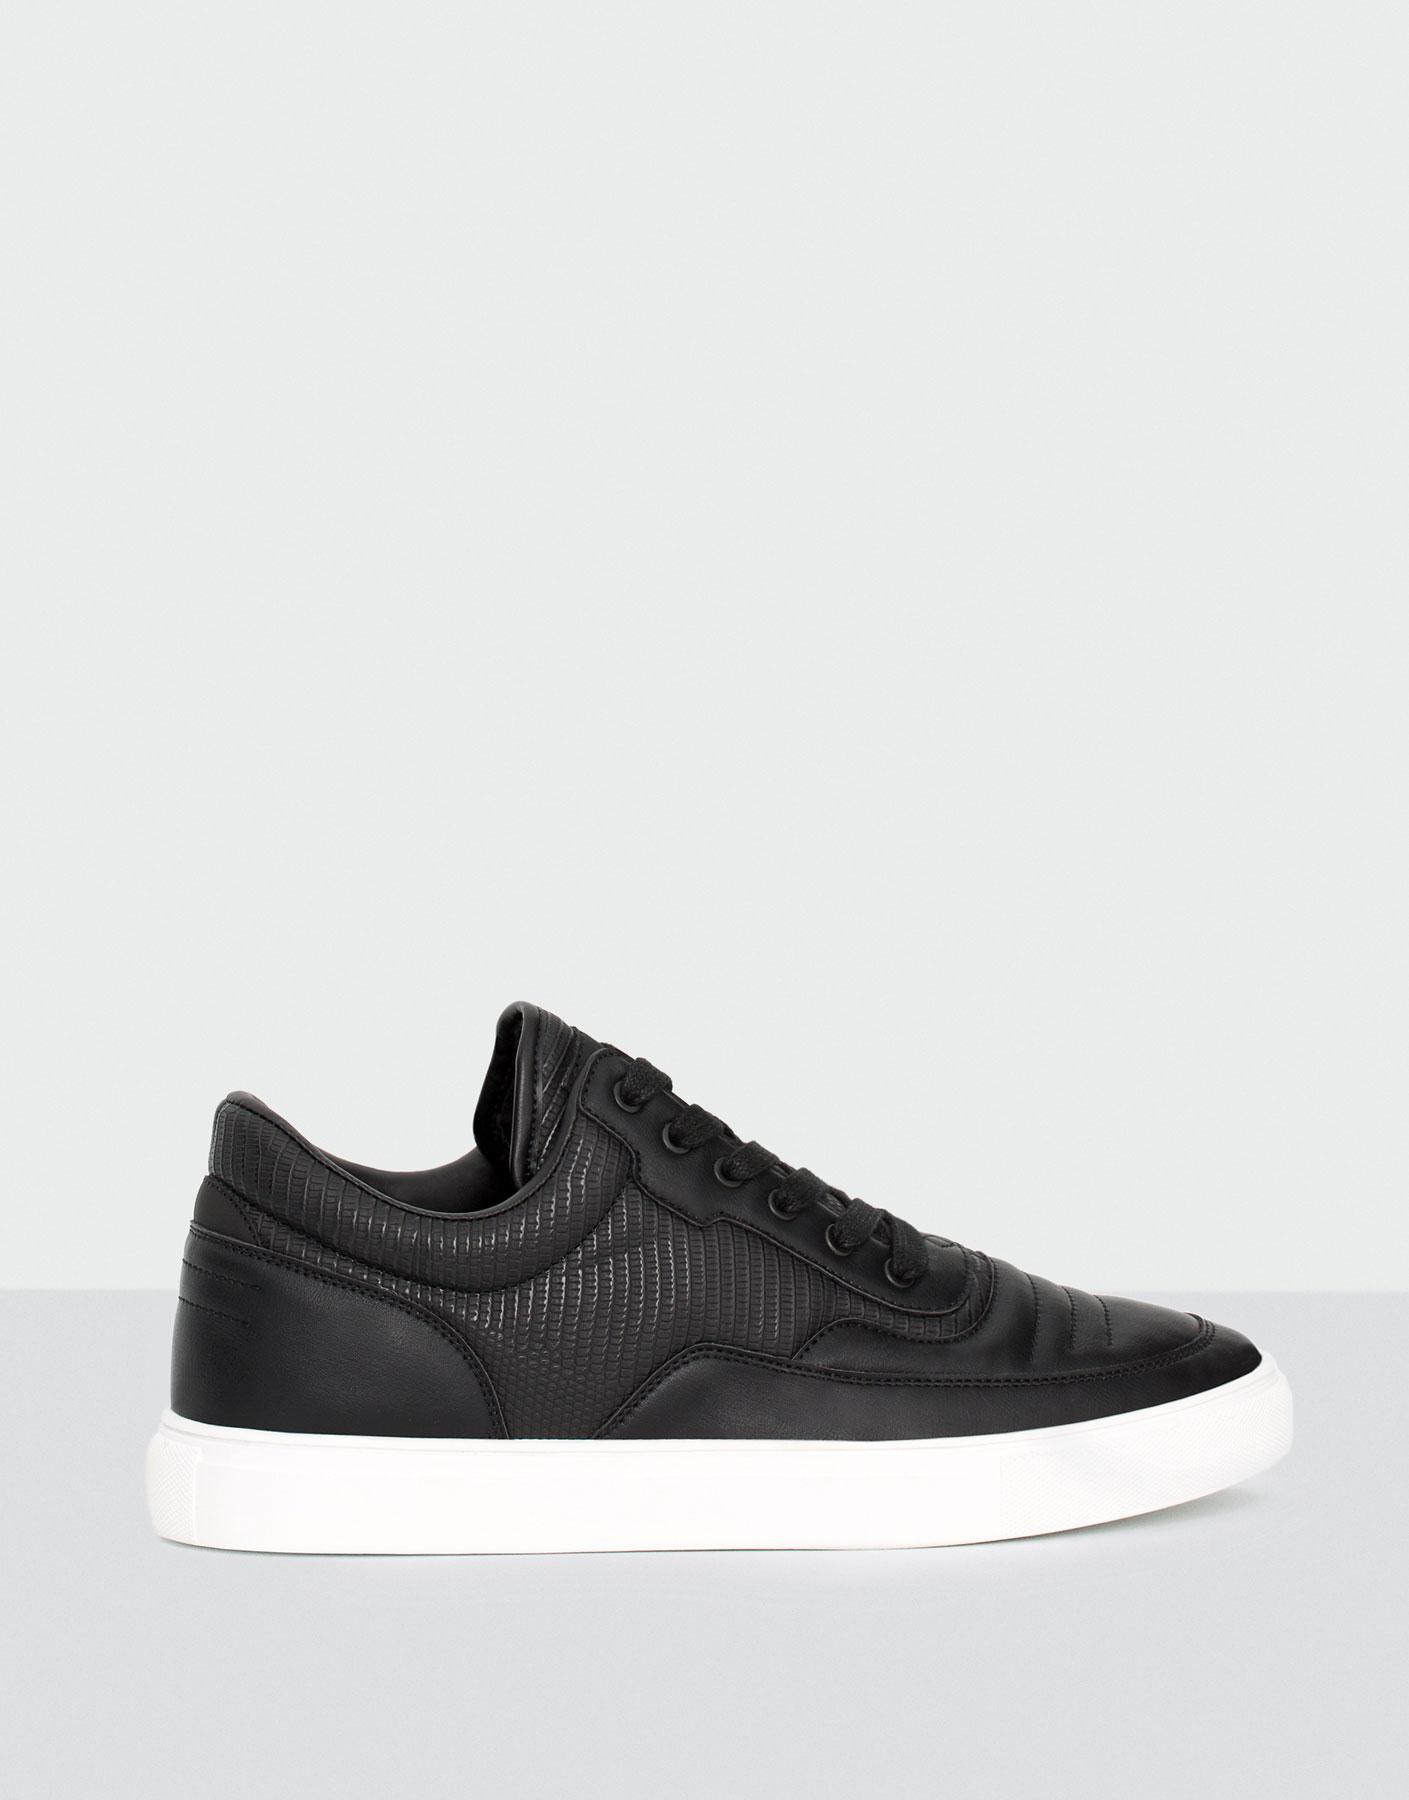 Zwarte hoge sportschoen